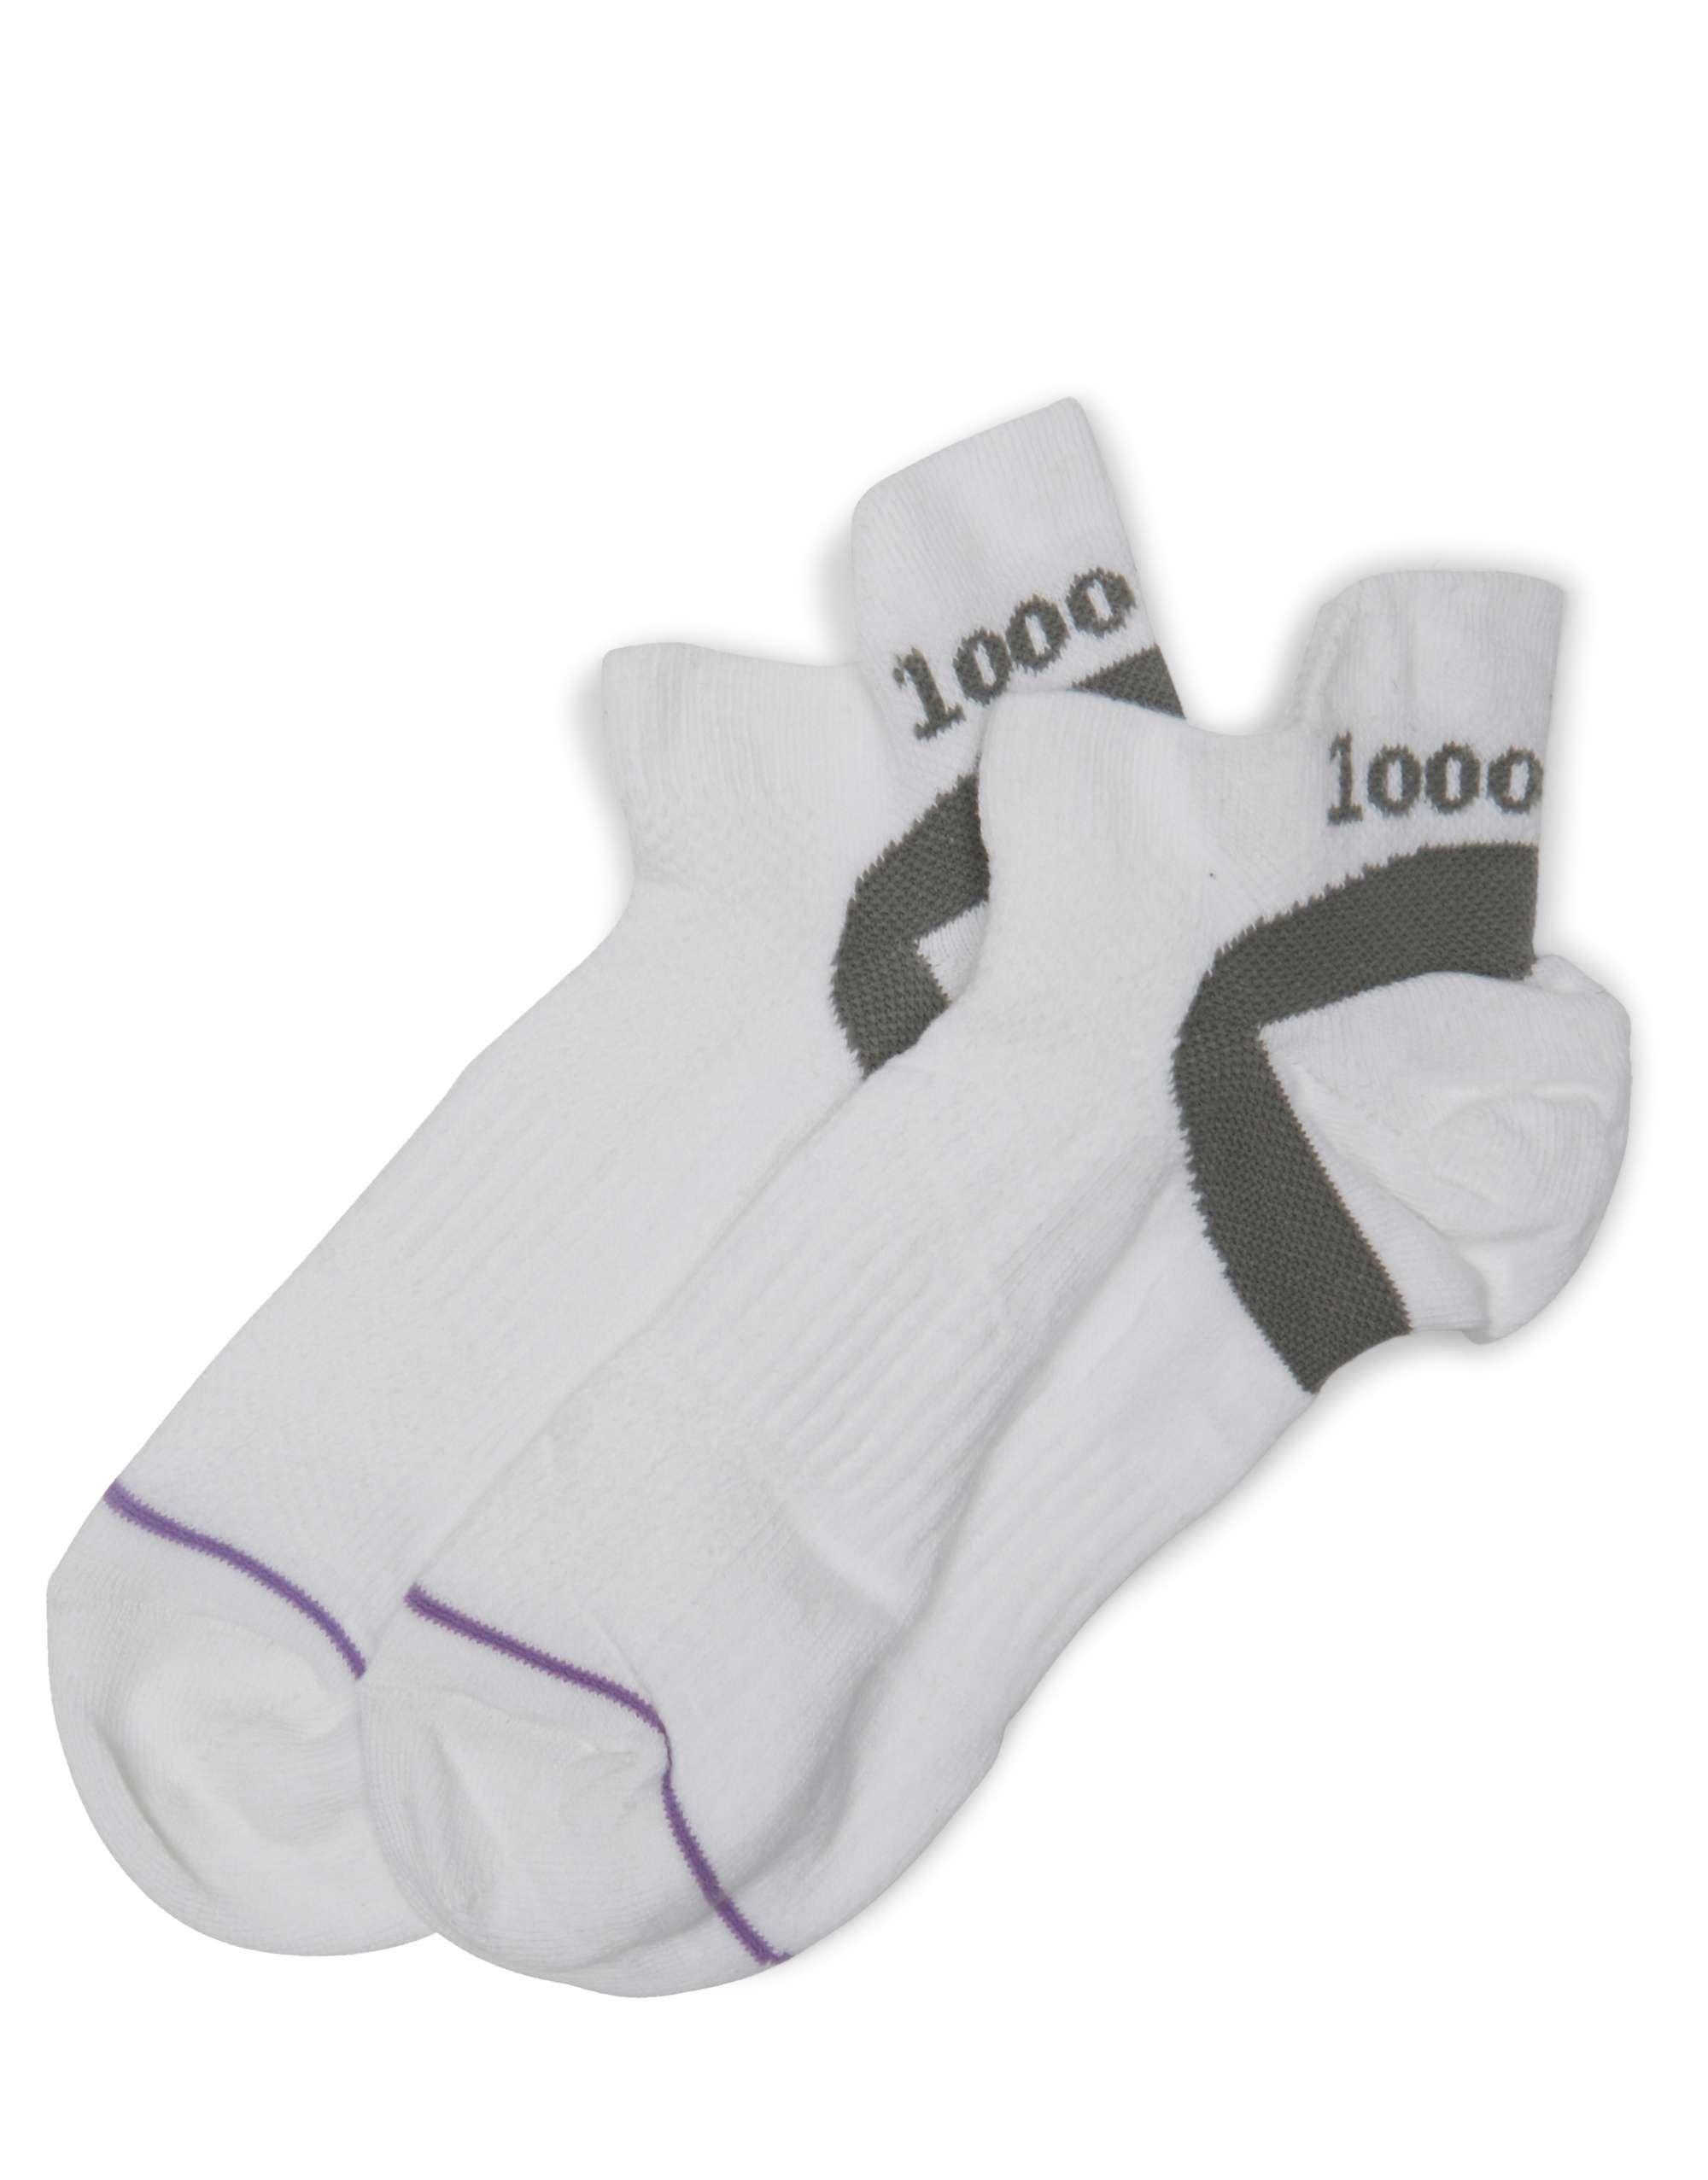 1000 Mile Tactel Trainer Liner